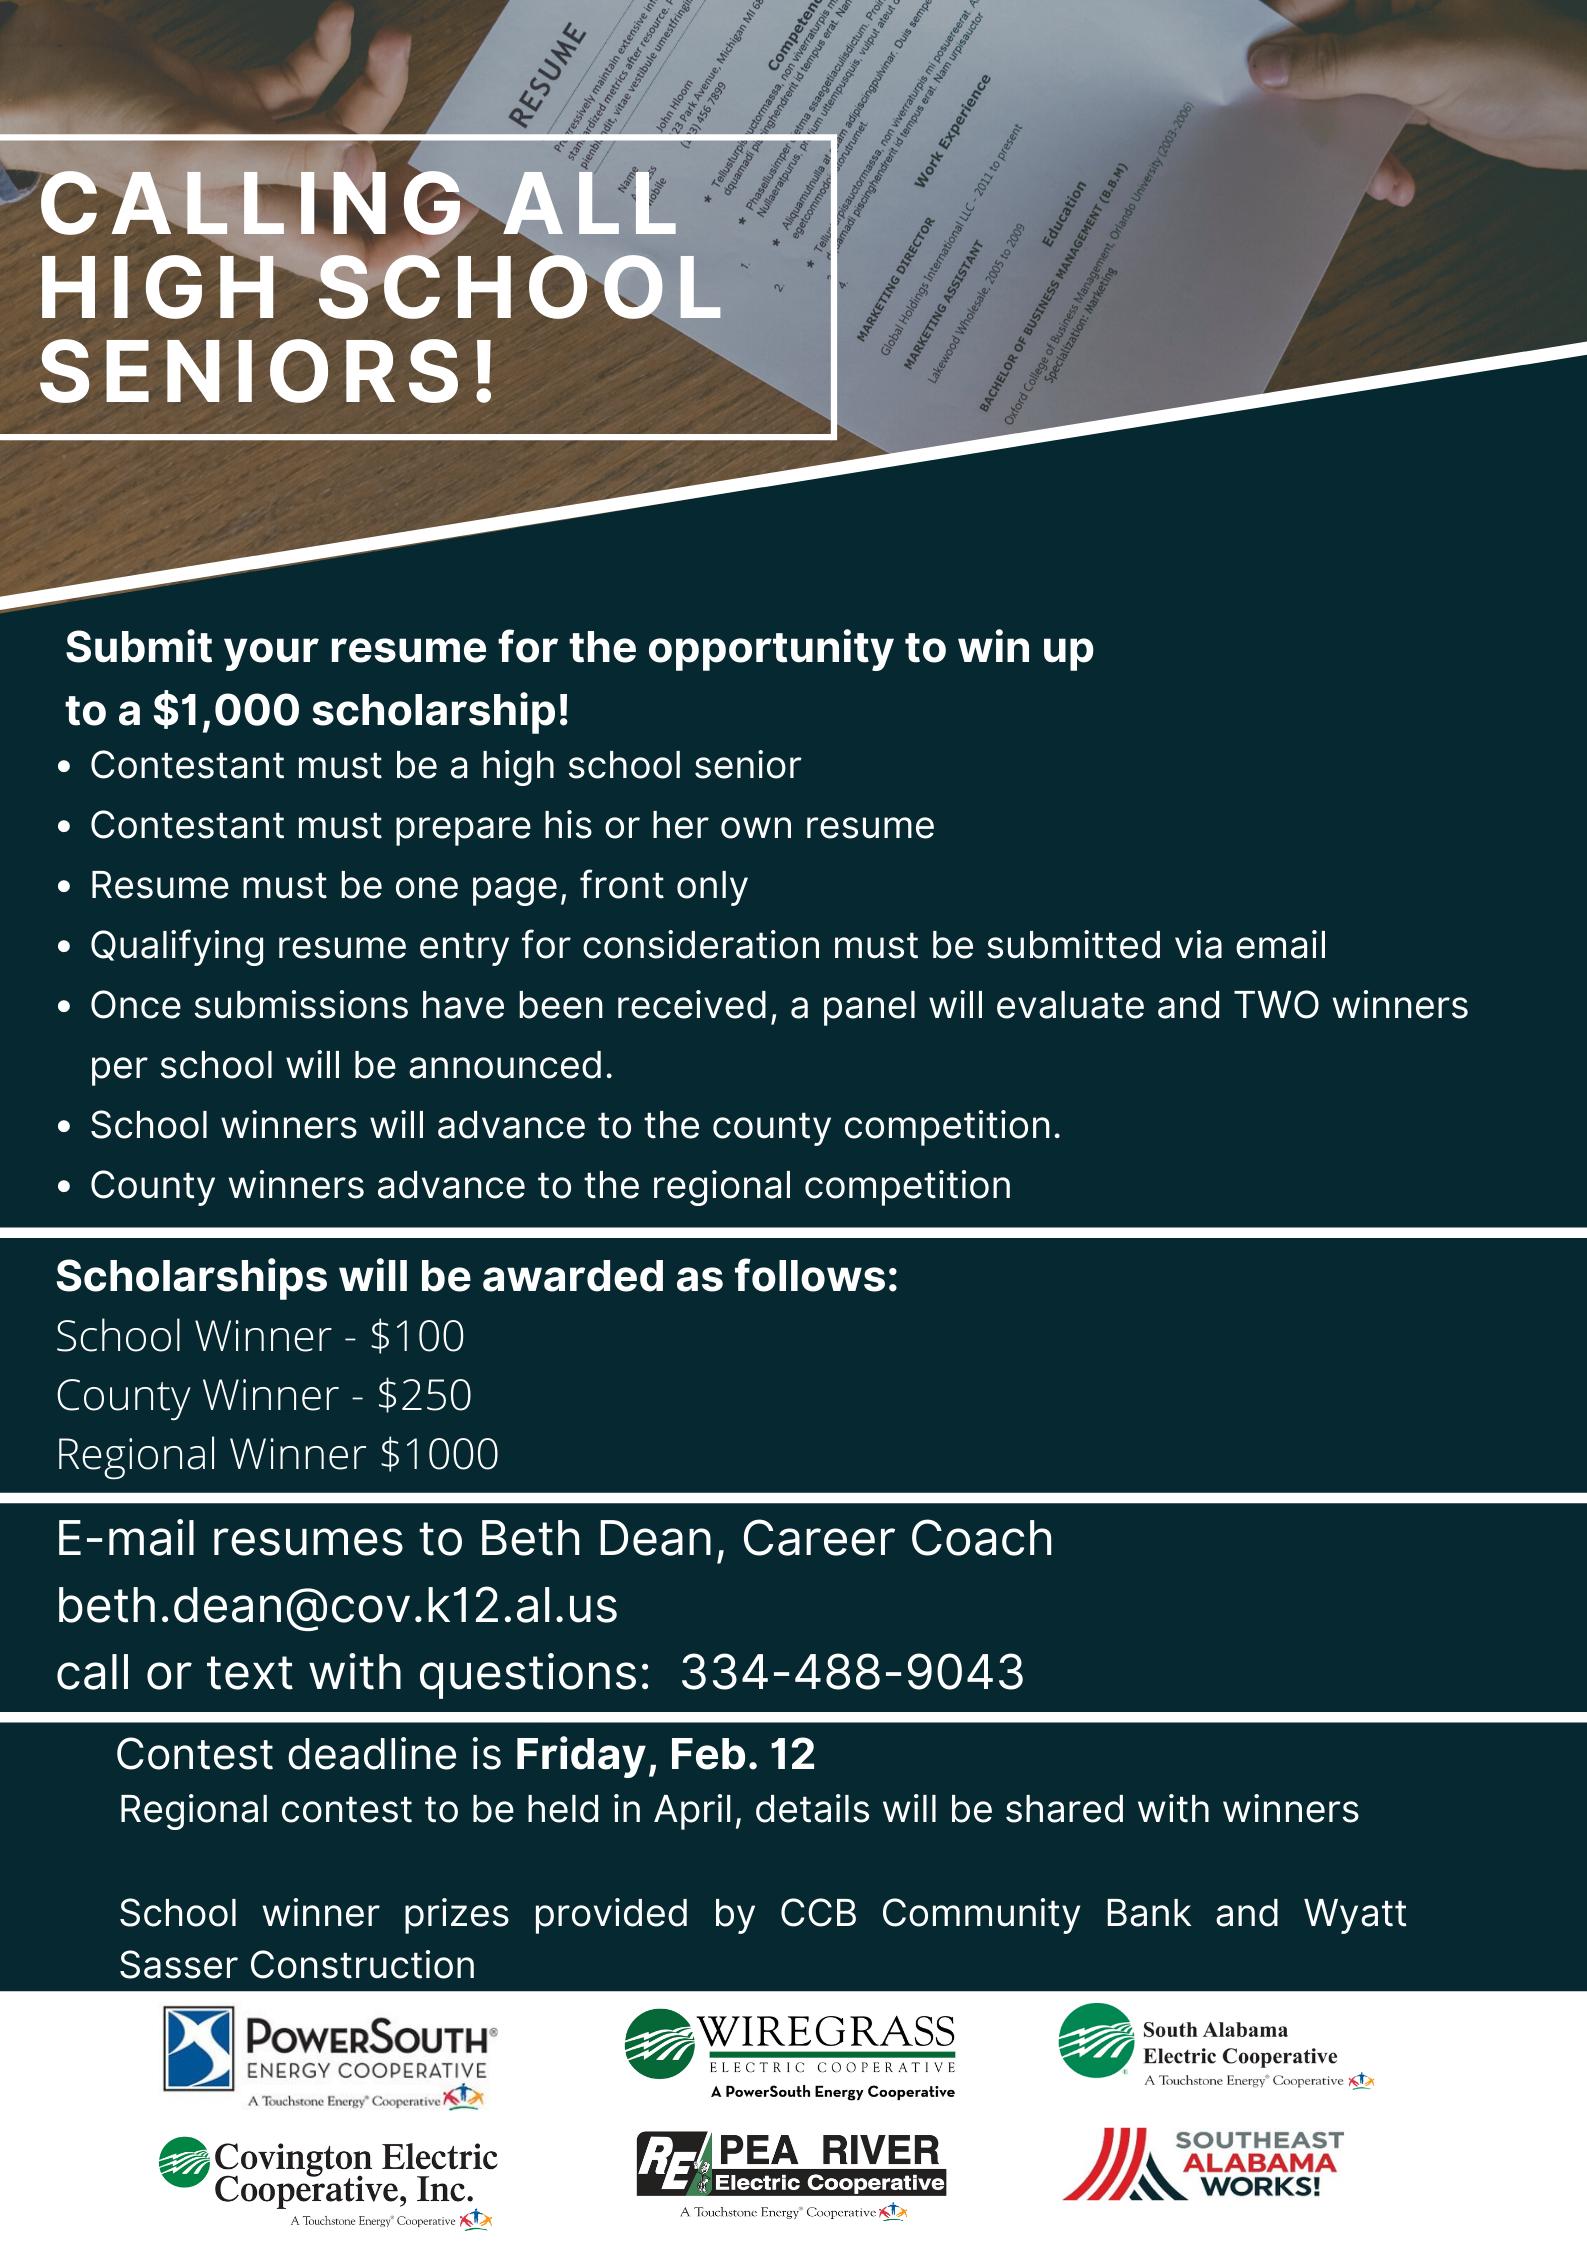 Resume contest for Seniors